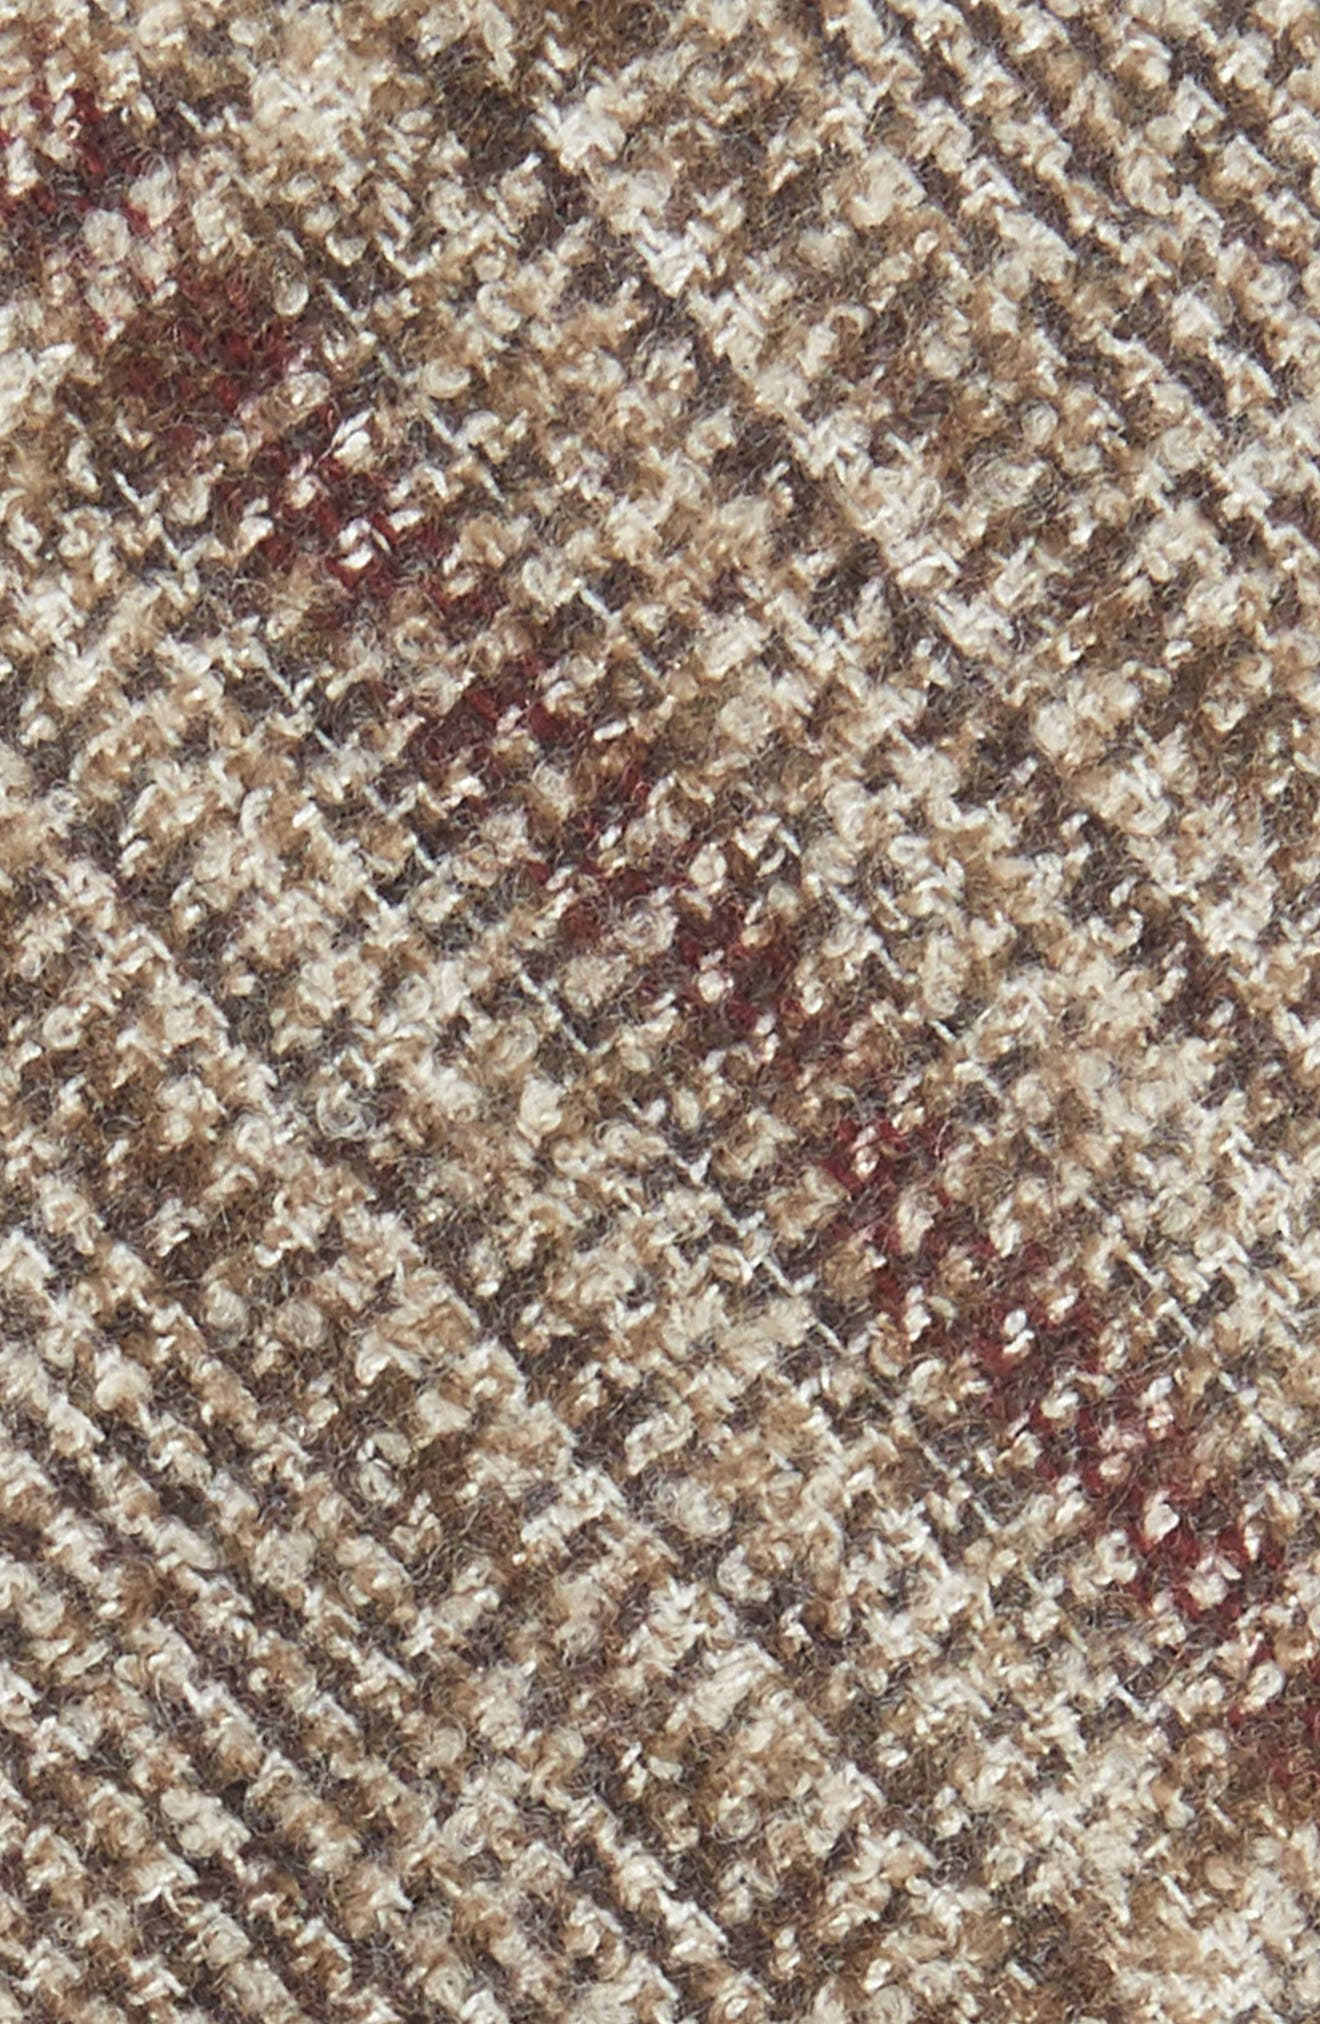 Glencheck Wool Blend Skinny Tie,                             Alternate thumbnail 2, color,                             Dark Beige